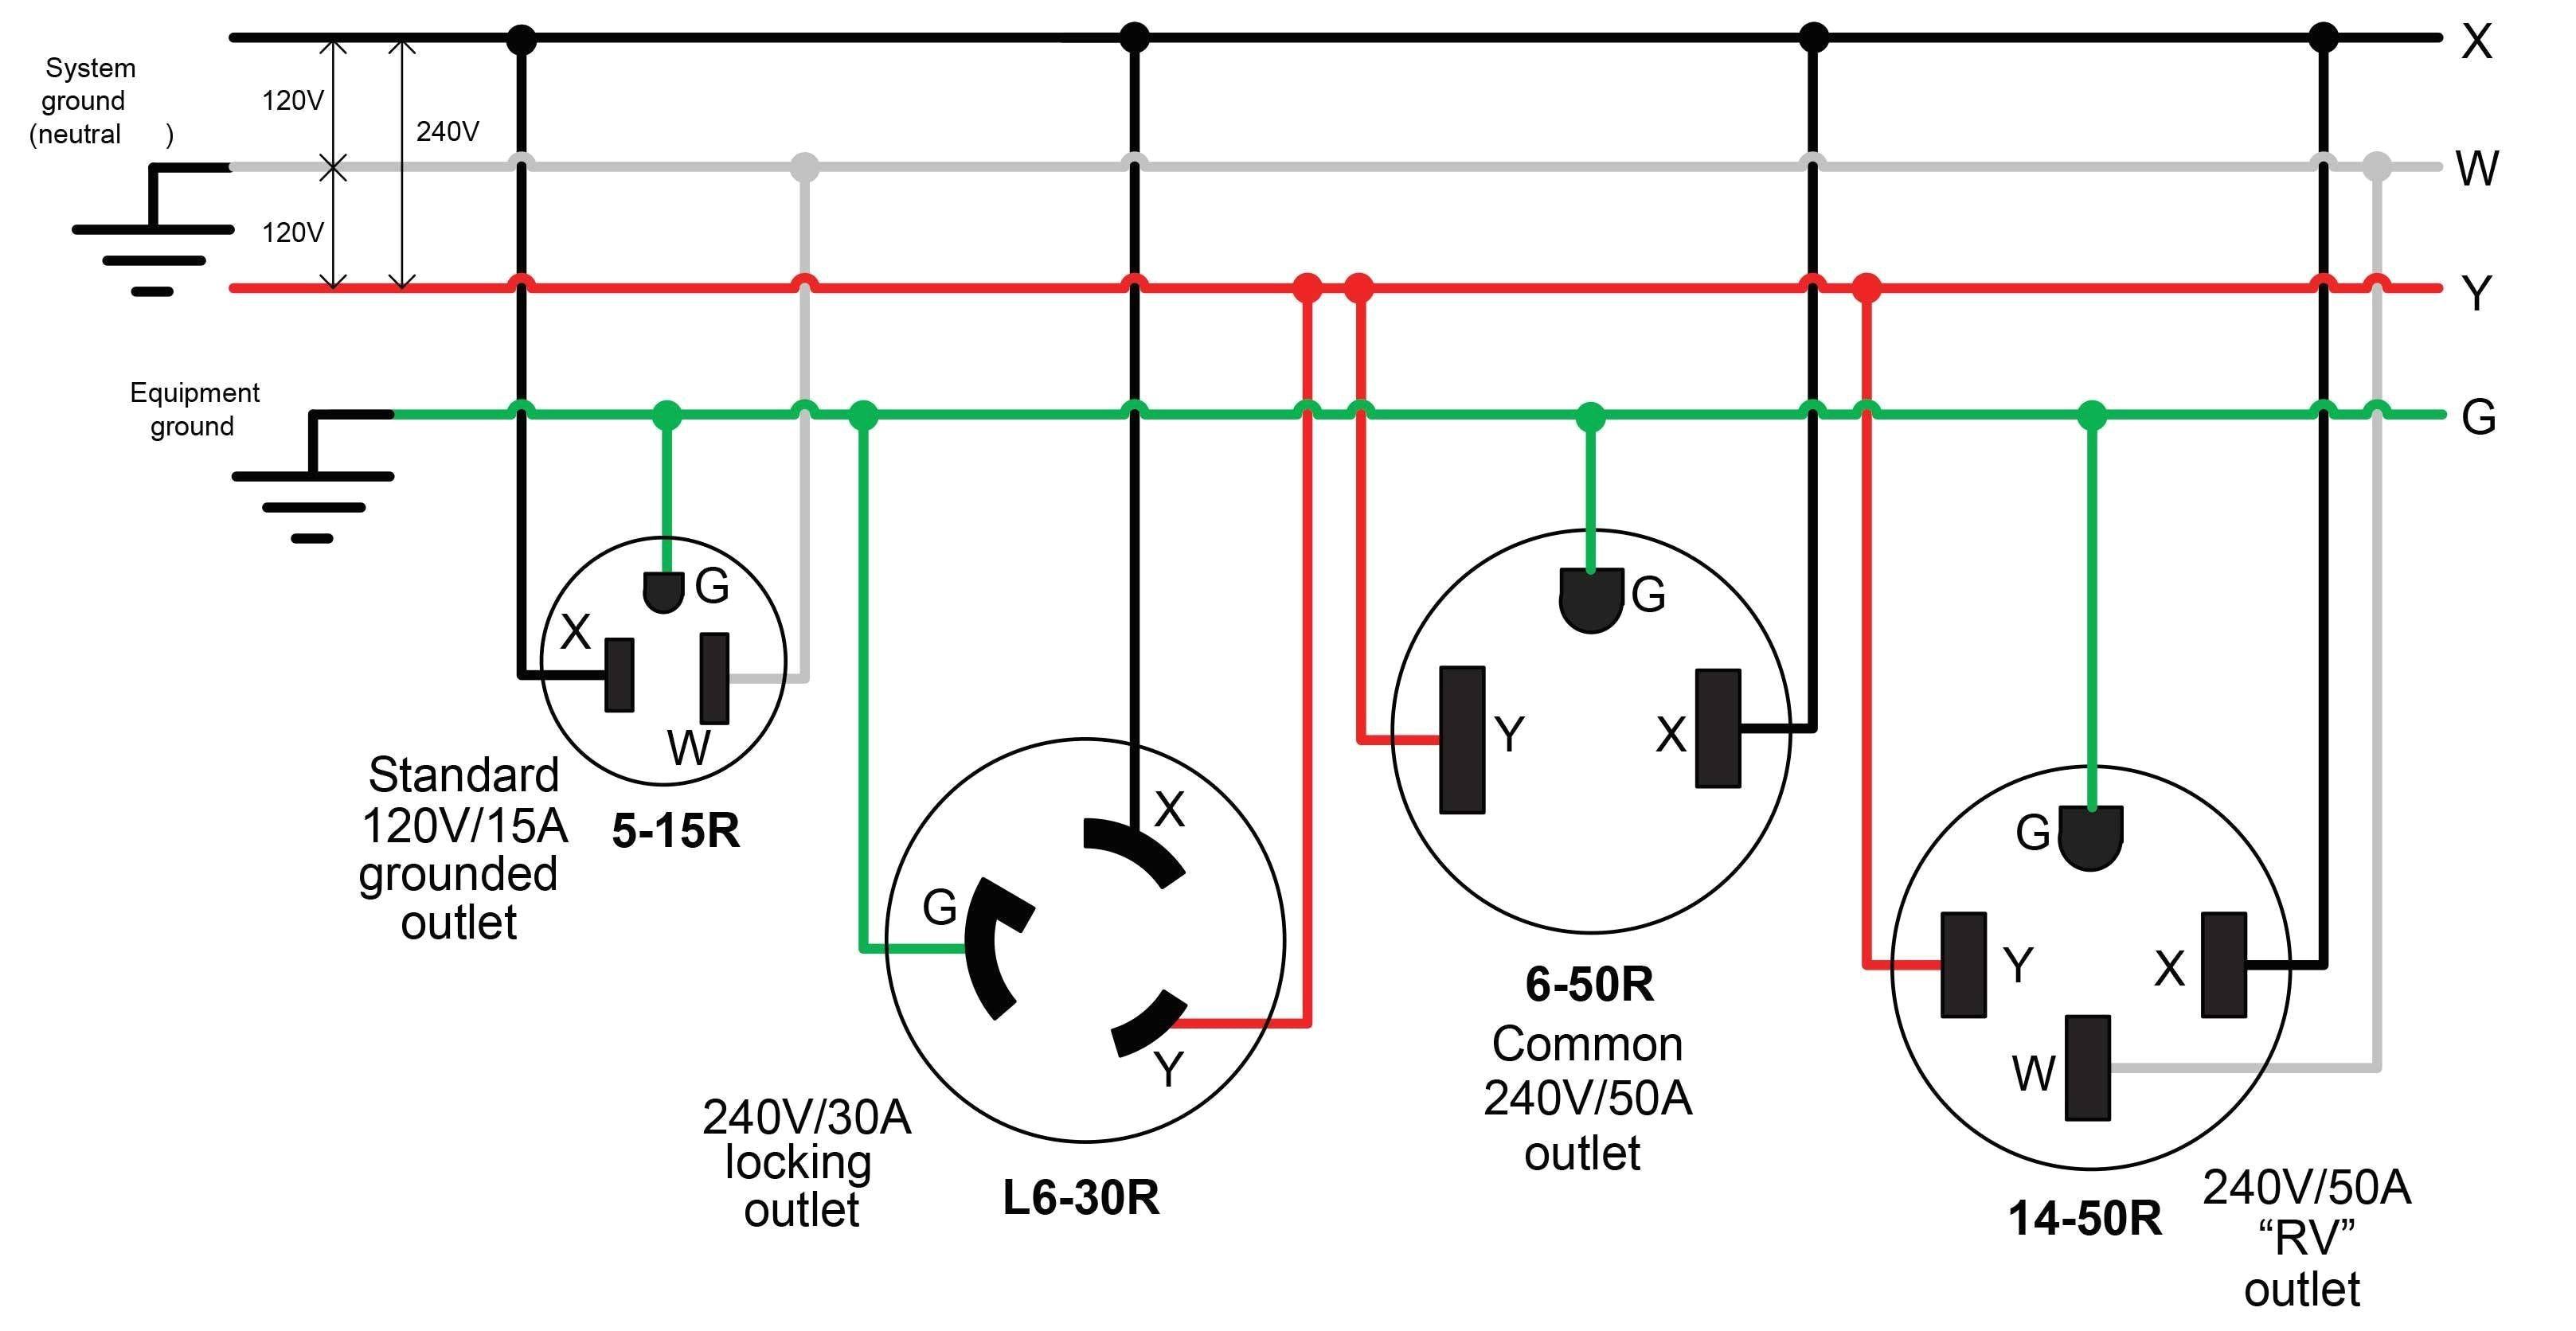 4 Pin Plug Wiring Diagram | Manual E-Books - 7 Pin Trailer Plug Wiring Diagram